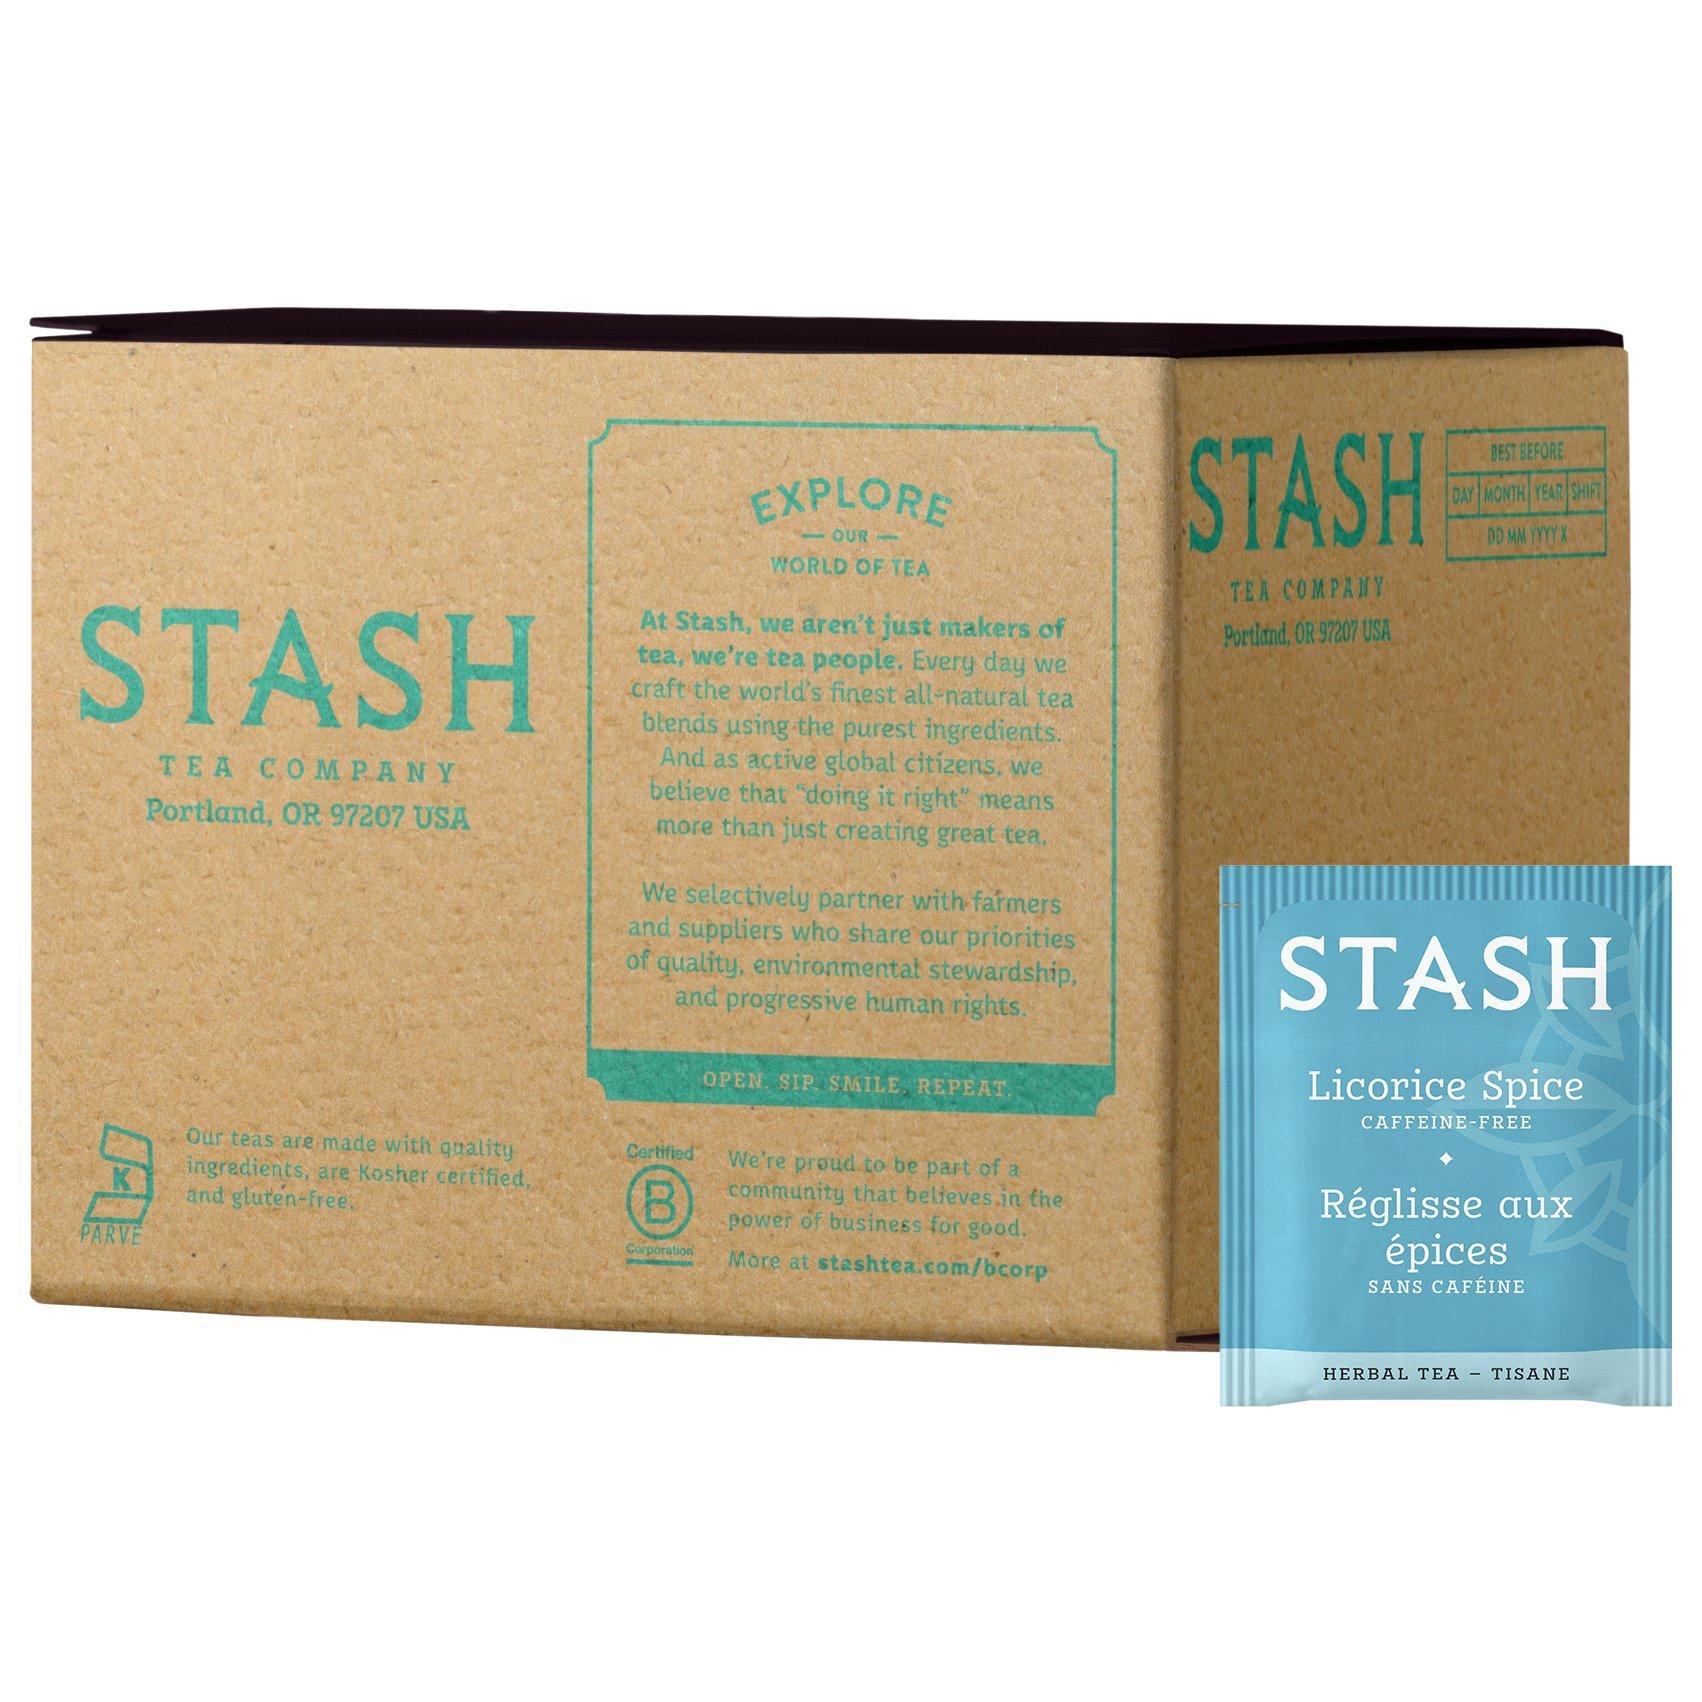 Stash Tea Licorice Spice Herbal Tea 100 Count Box of Tea Bags in Foil by Stash Tea